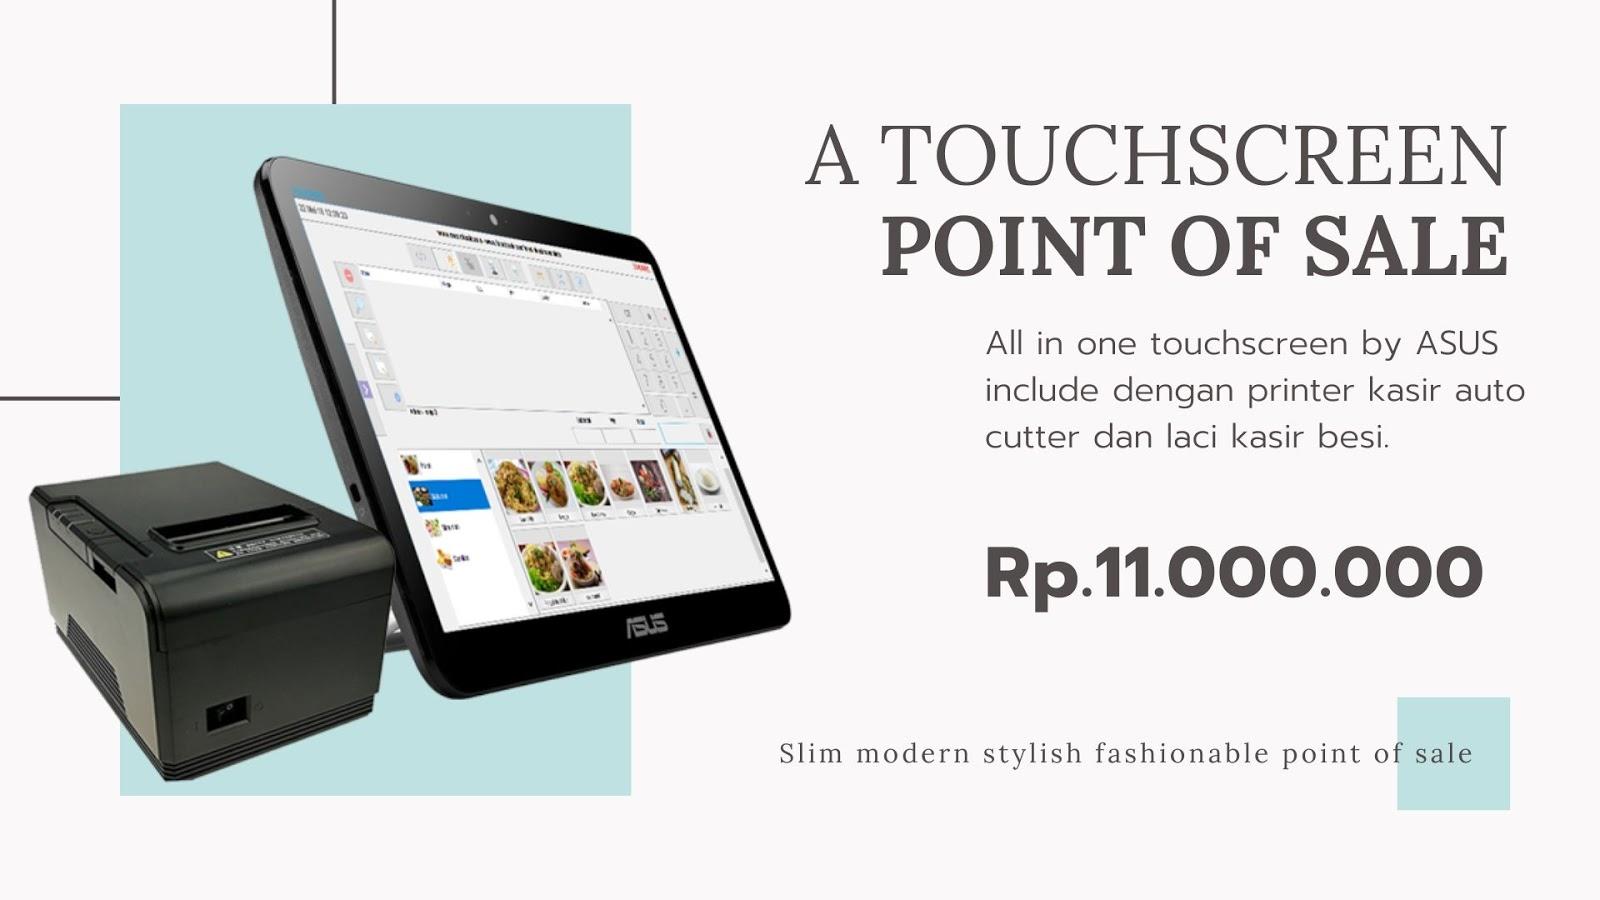 aplikasi kasir online,android,iphone,win,mesin kasir online